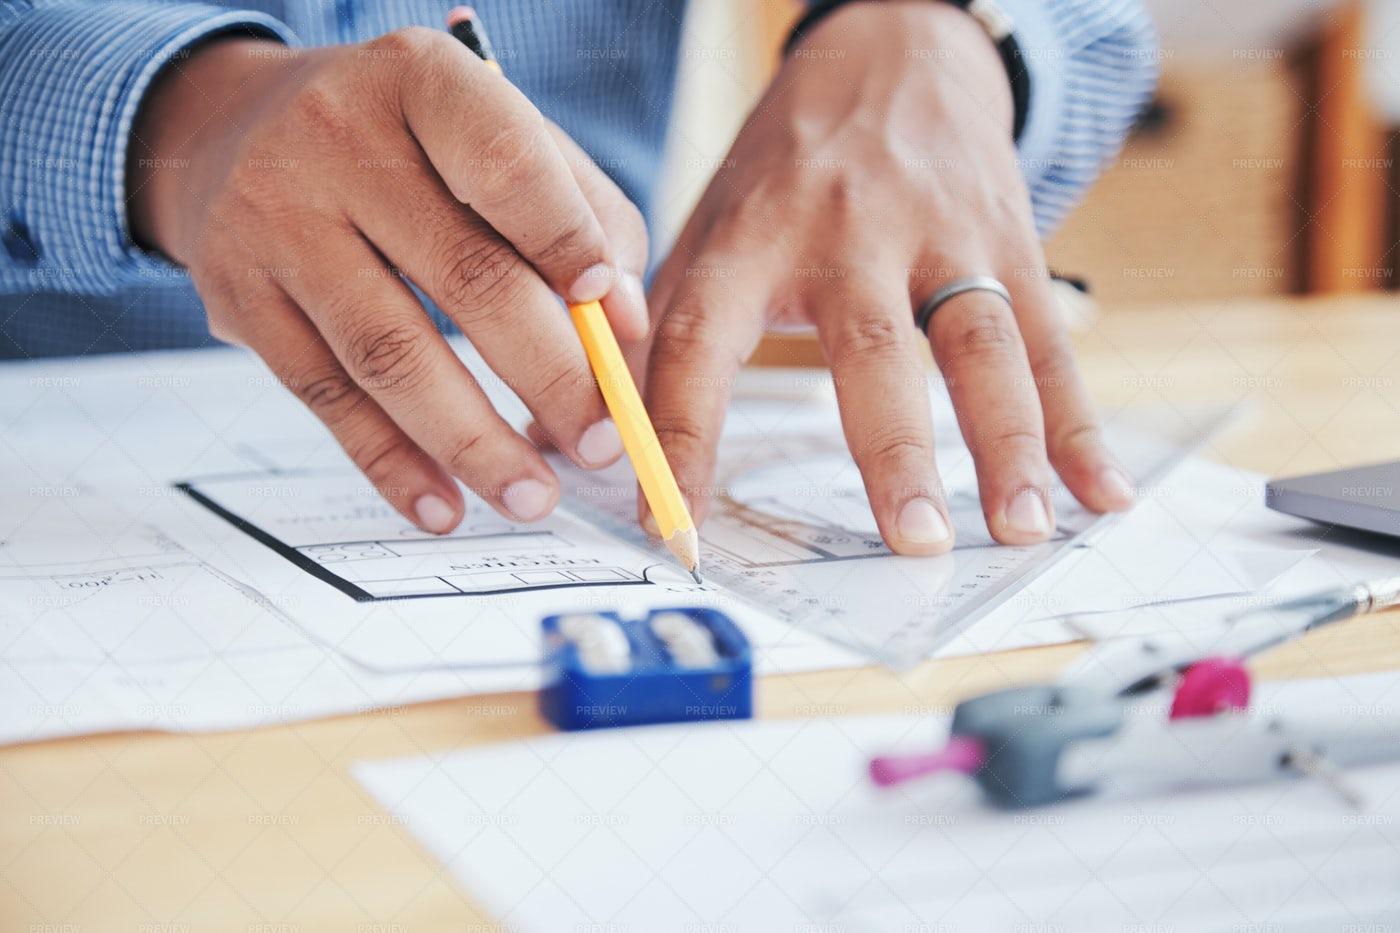 Hands Working On Blueprint: Stock Photos